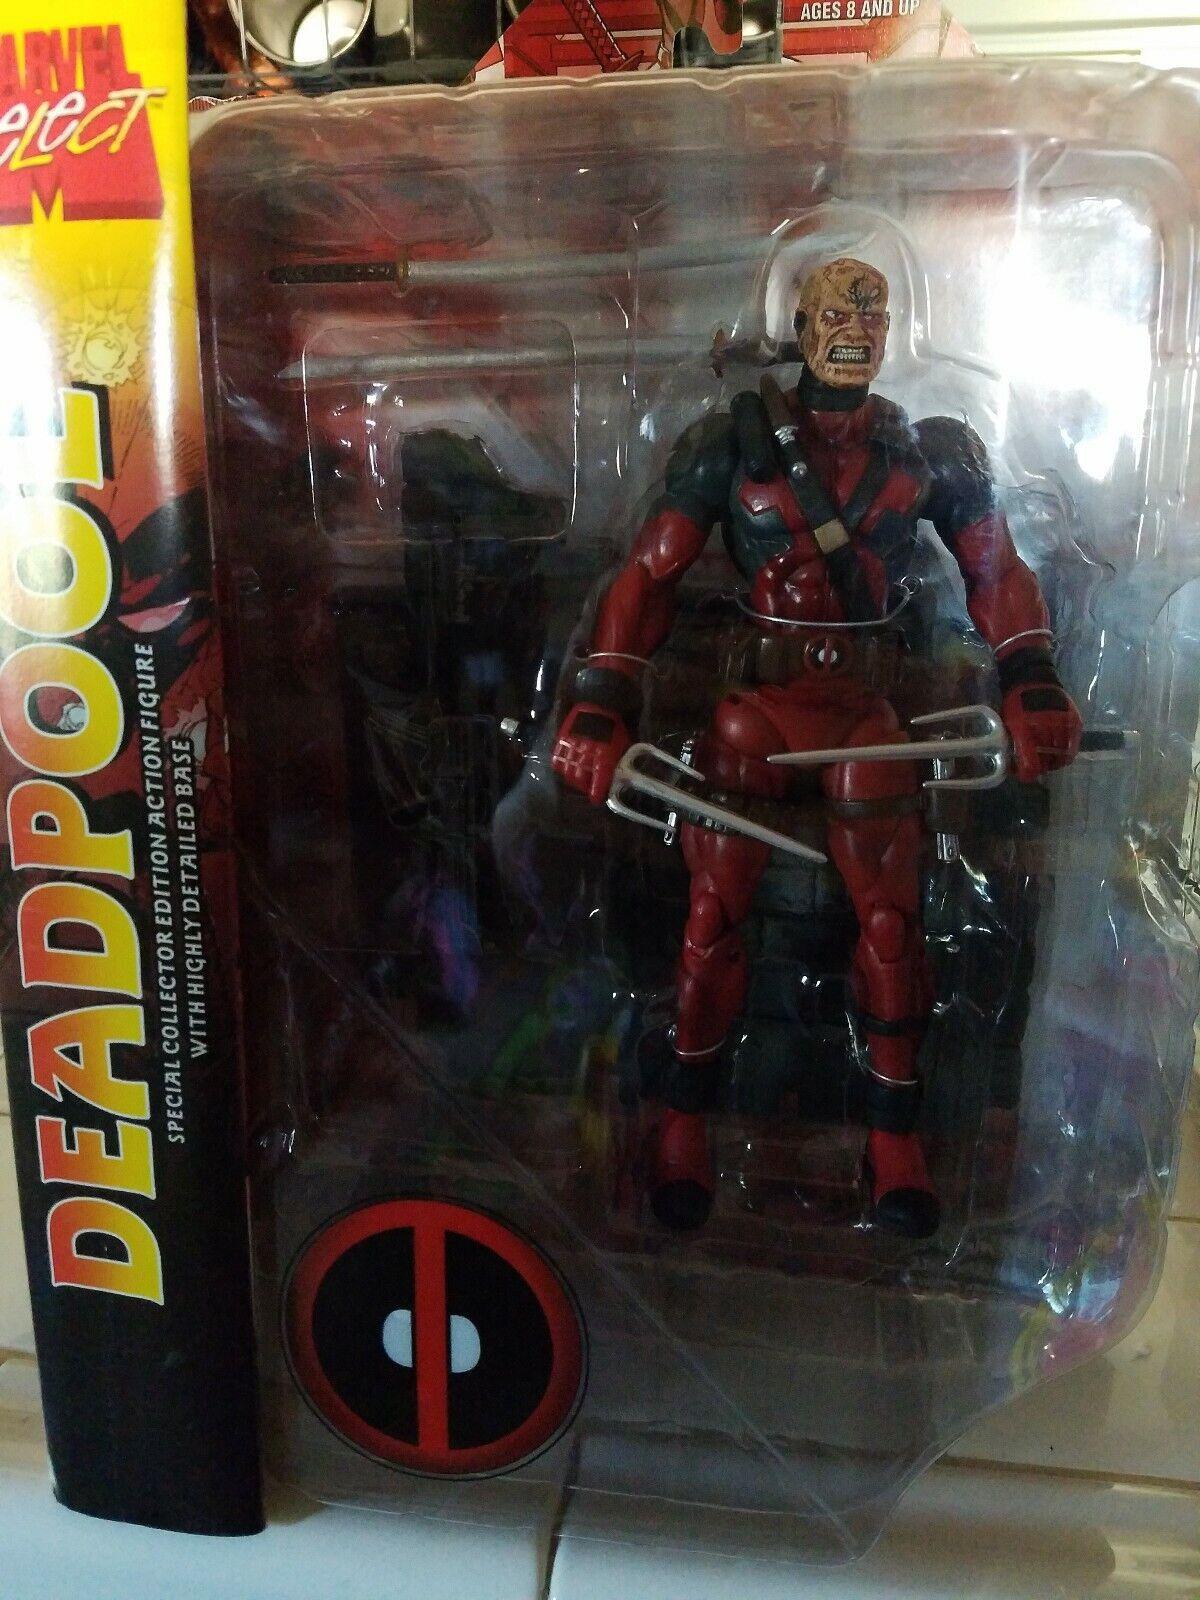 Marvel Diamond Select Deadpool nouveau  in box  abordable